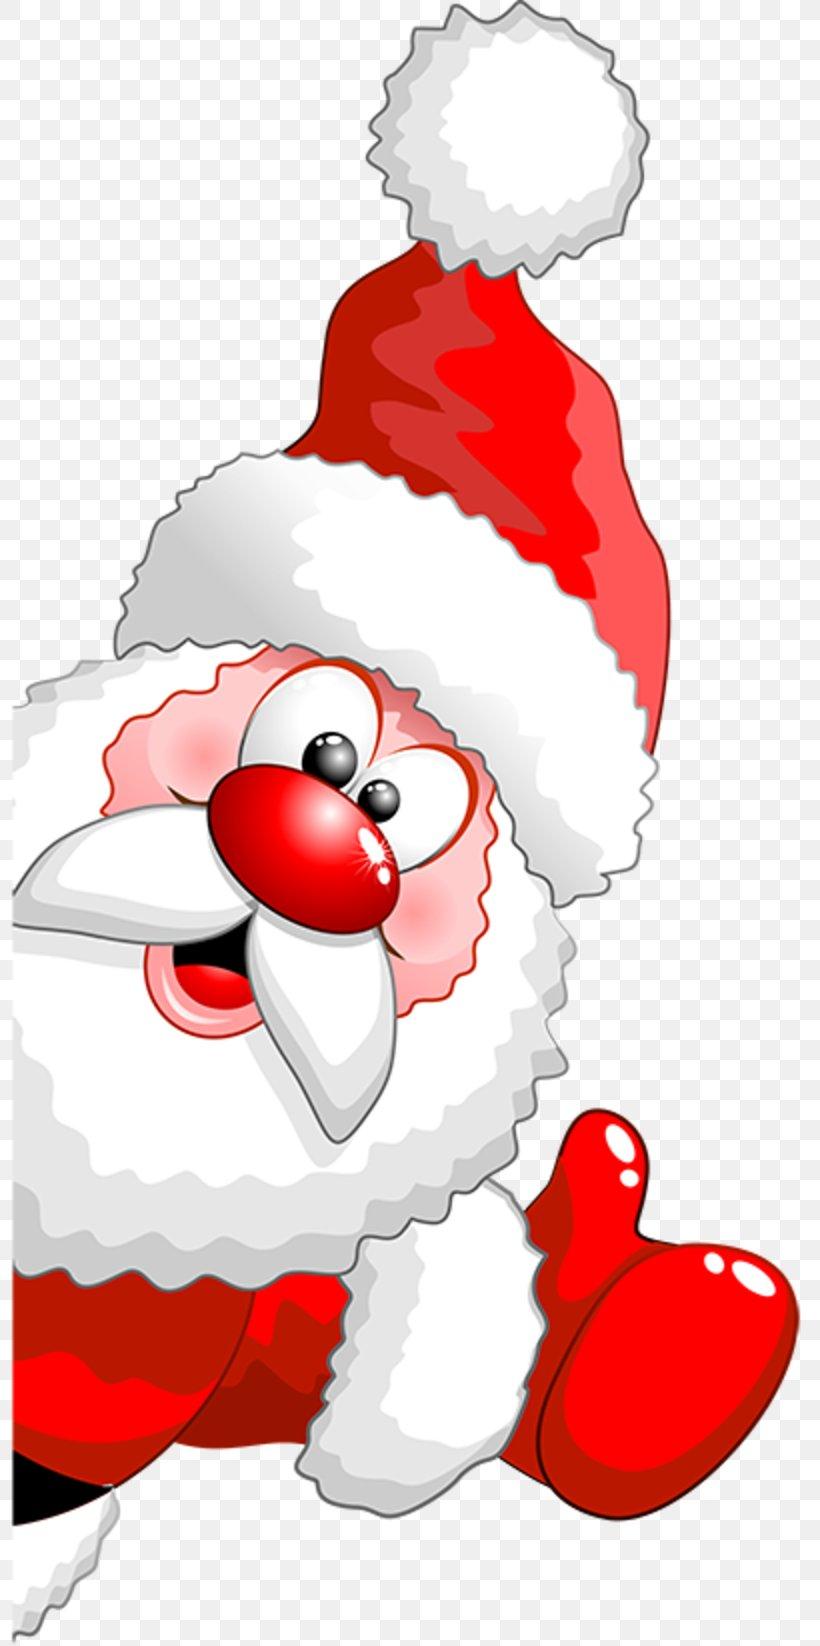 Santa Claus Reindeer Cartoon Christmas